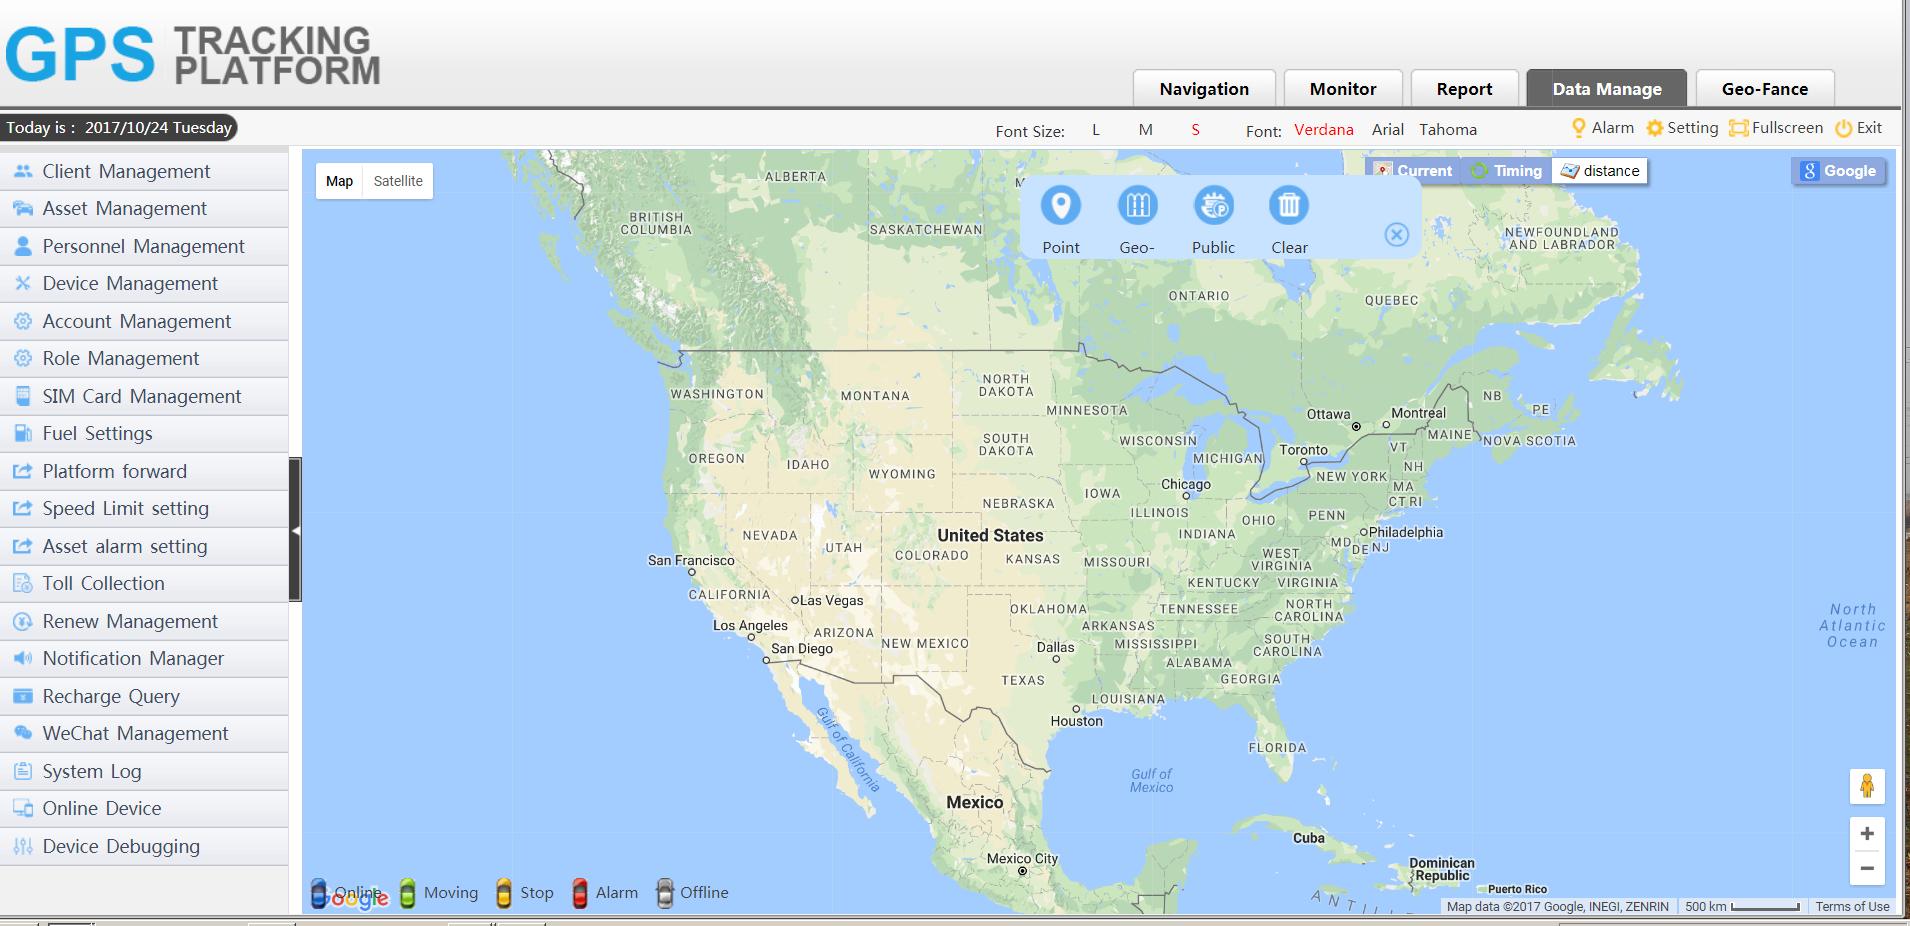 gps tracker platform data manage